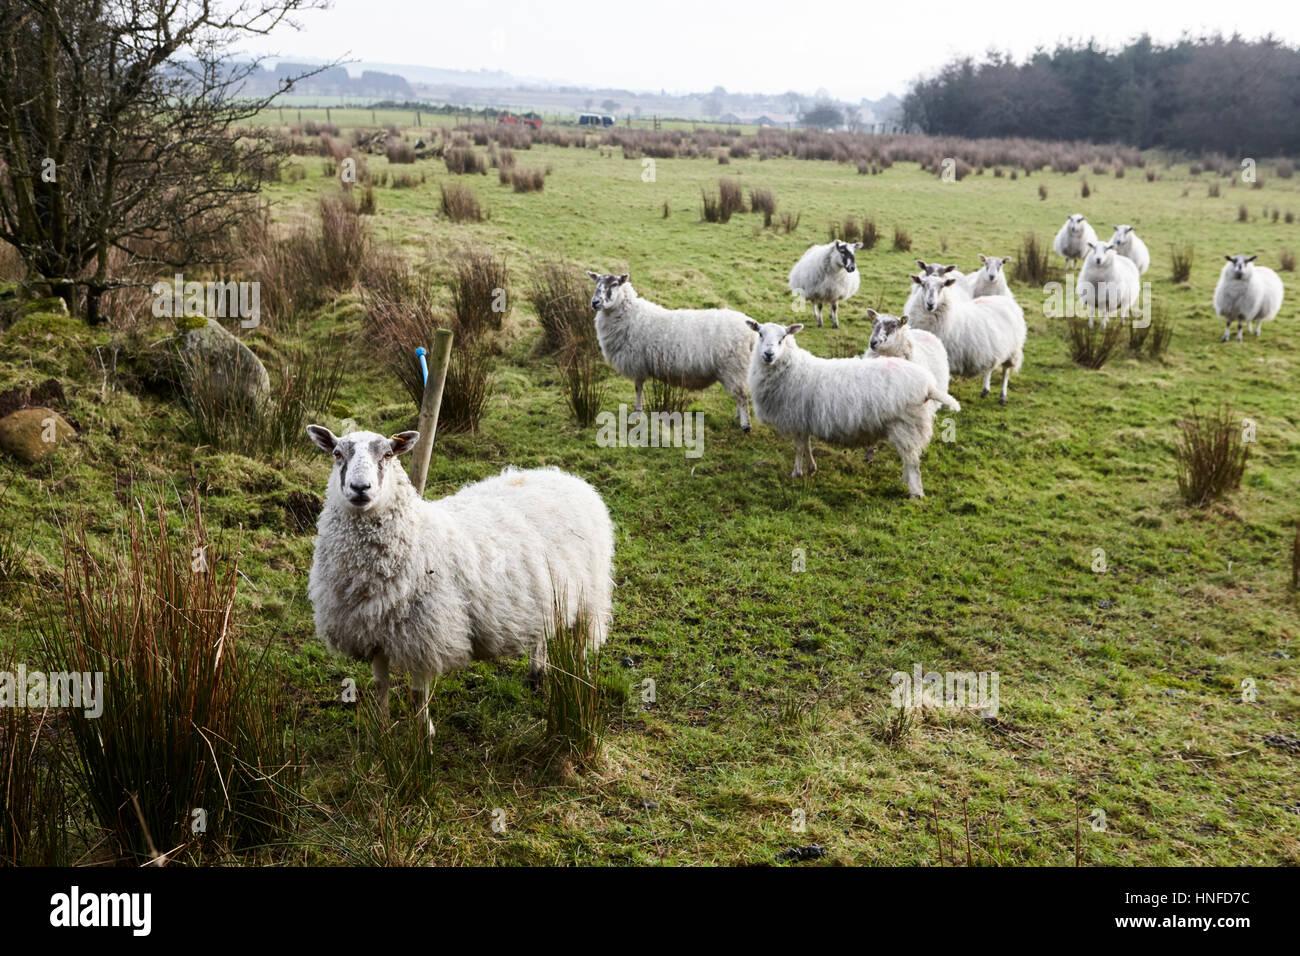 flock of sheep in a field ballymena, county antrim, northern ireland, uk - Stock Image